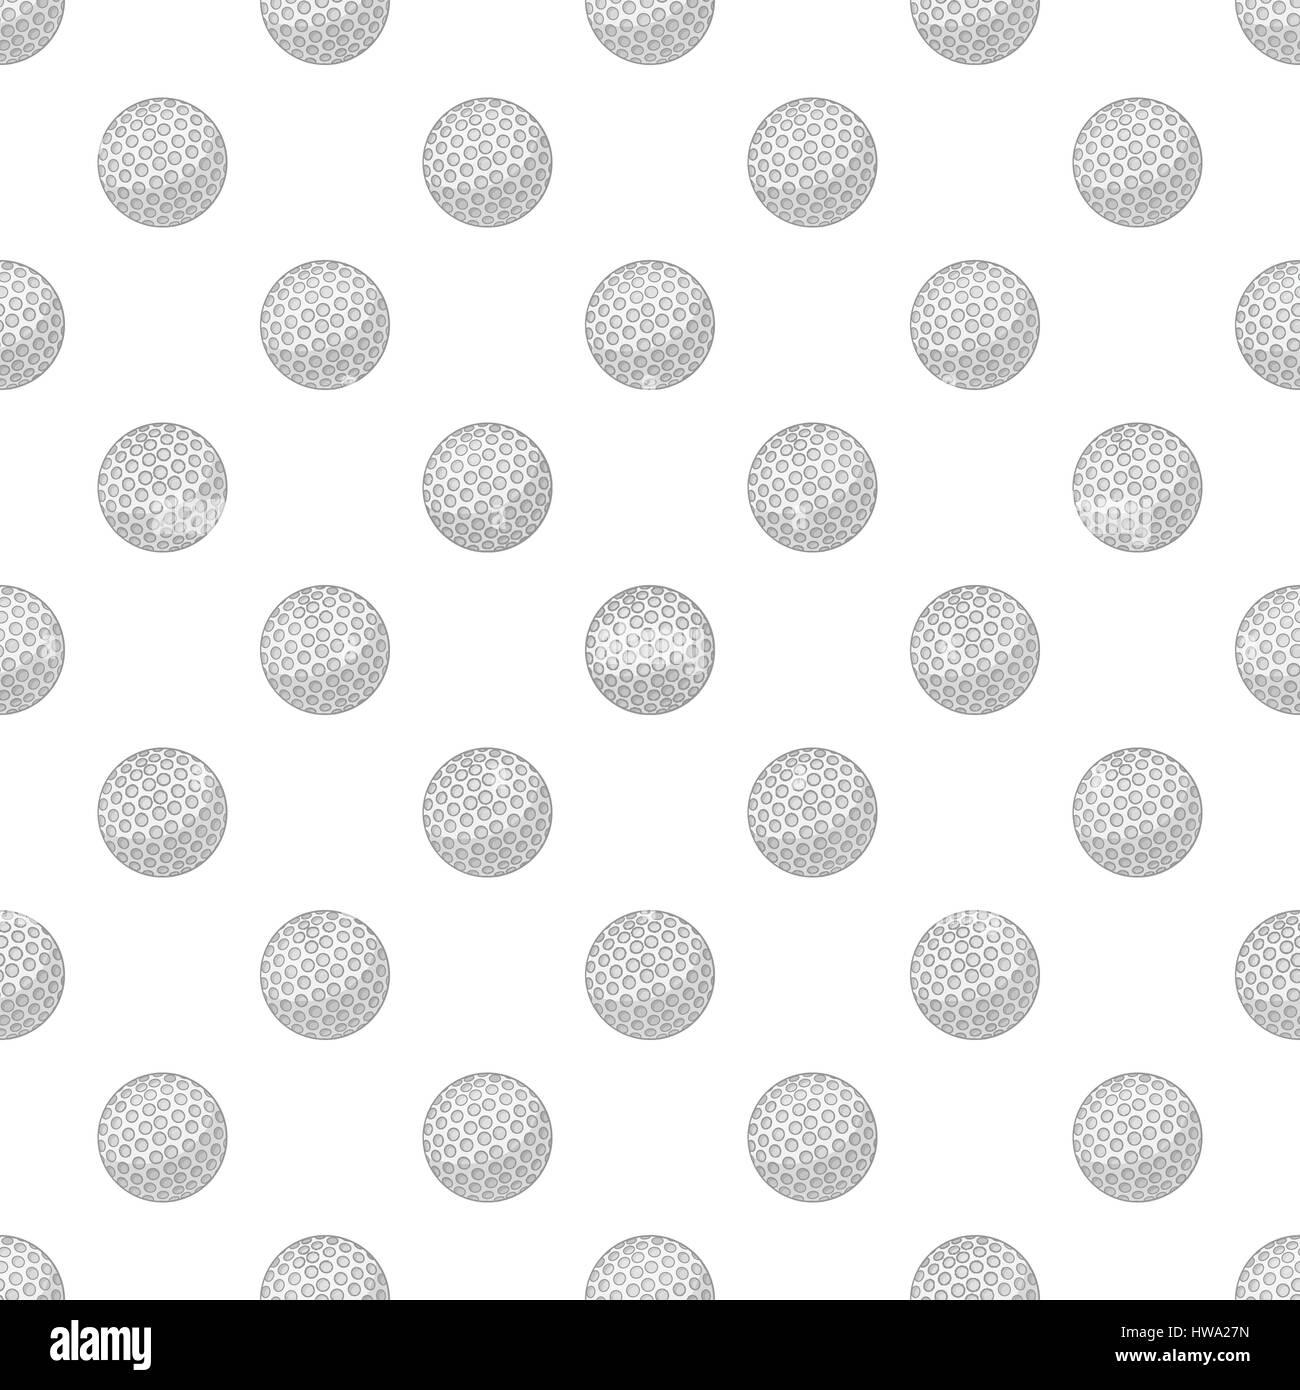 golf ball pattern cartoon style stock vector art